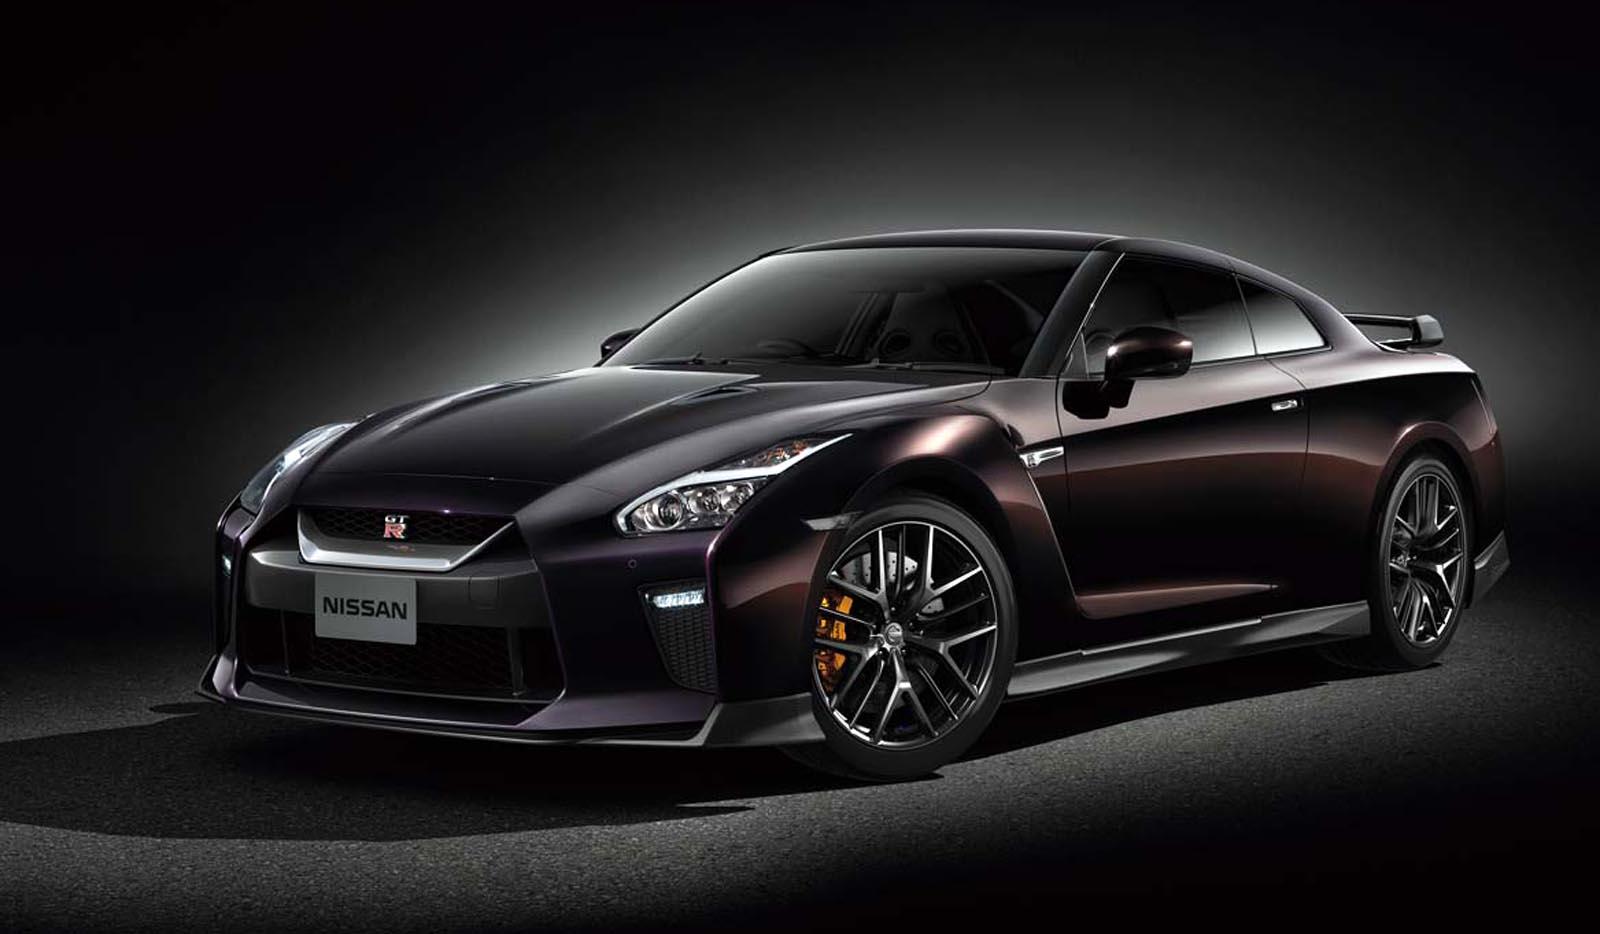 Photo of Η Nissan θα κατασκευάσει μια ειδική έκδοση του GT-R σε μόλις 50 μονάδες